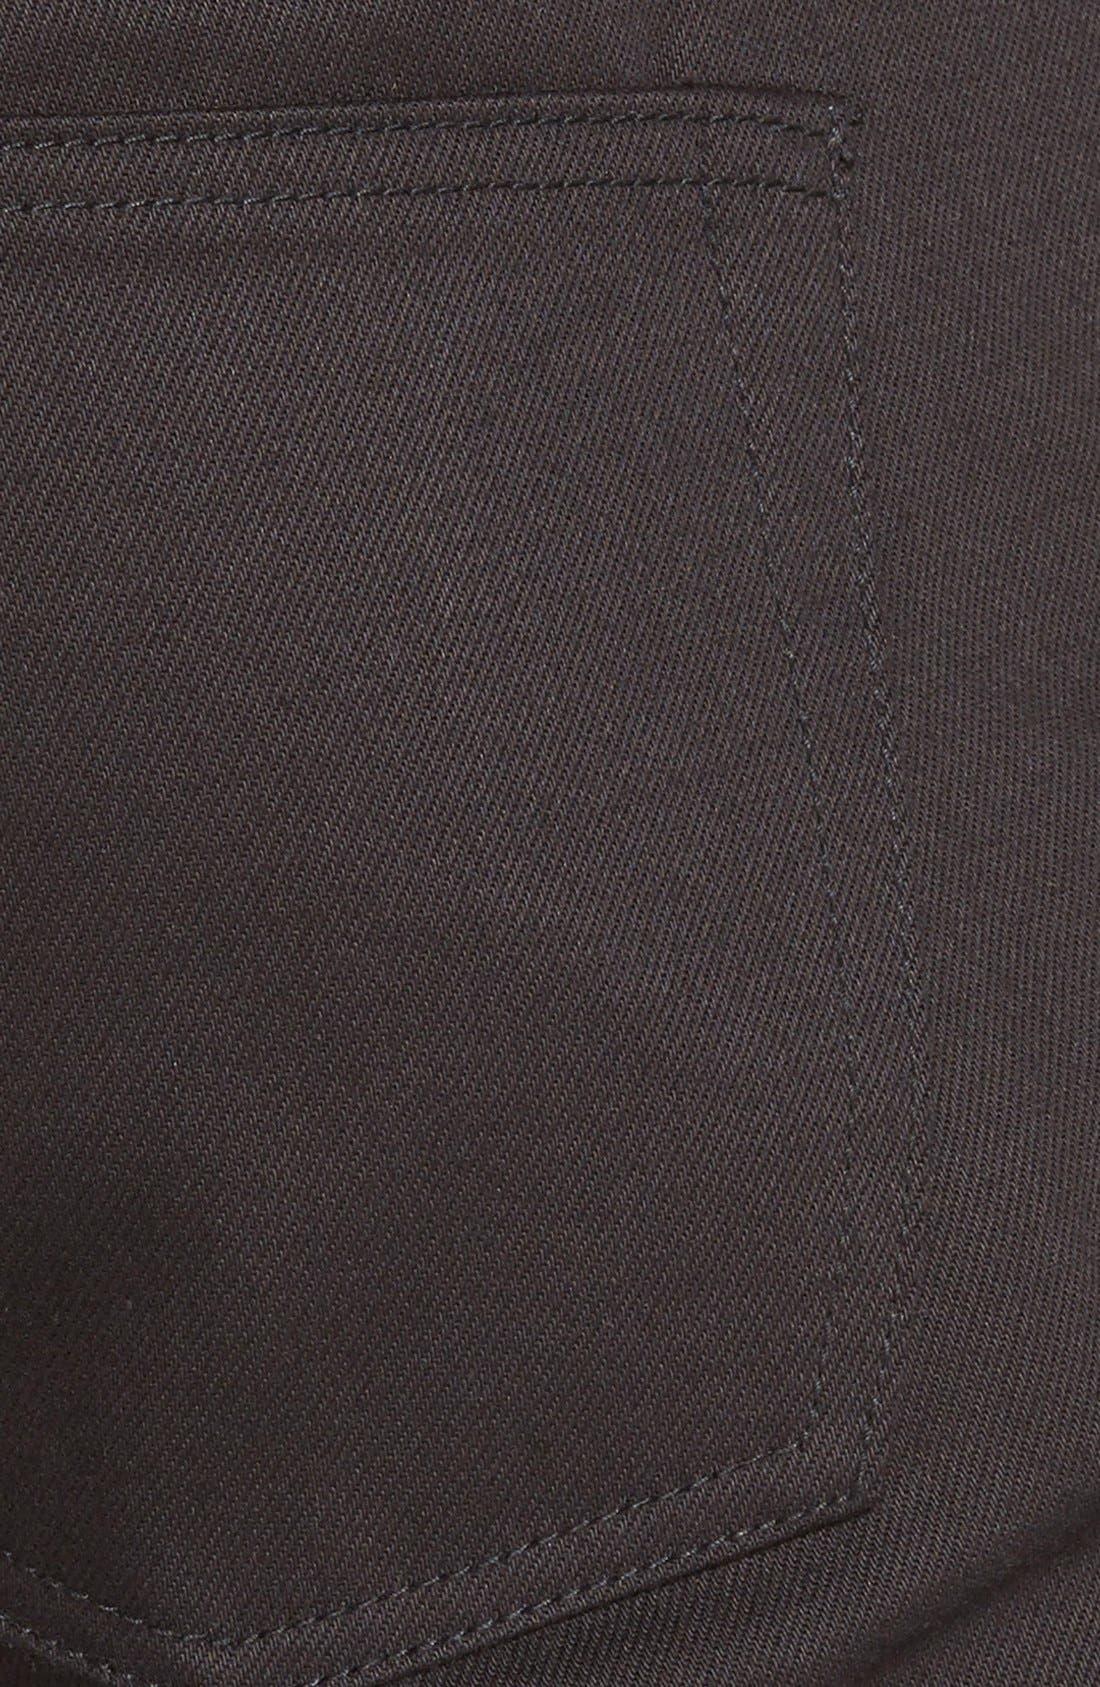 'UB155' Skinny Fit Raw Selvedge Jeans,                             Alternate thumbnail 3, color,                             001